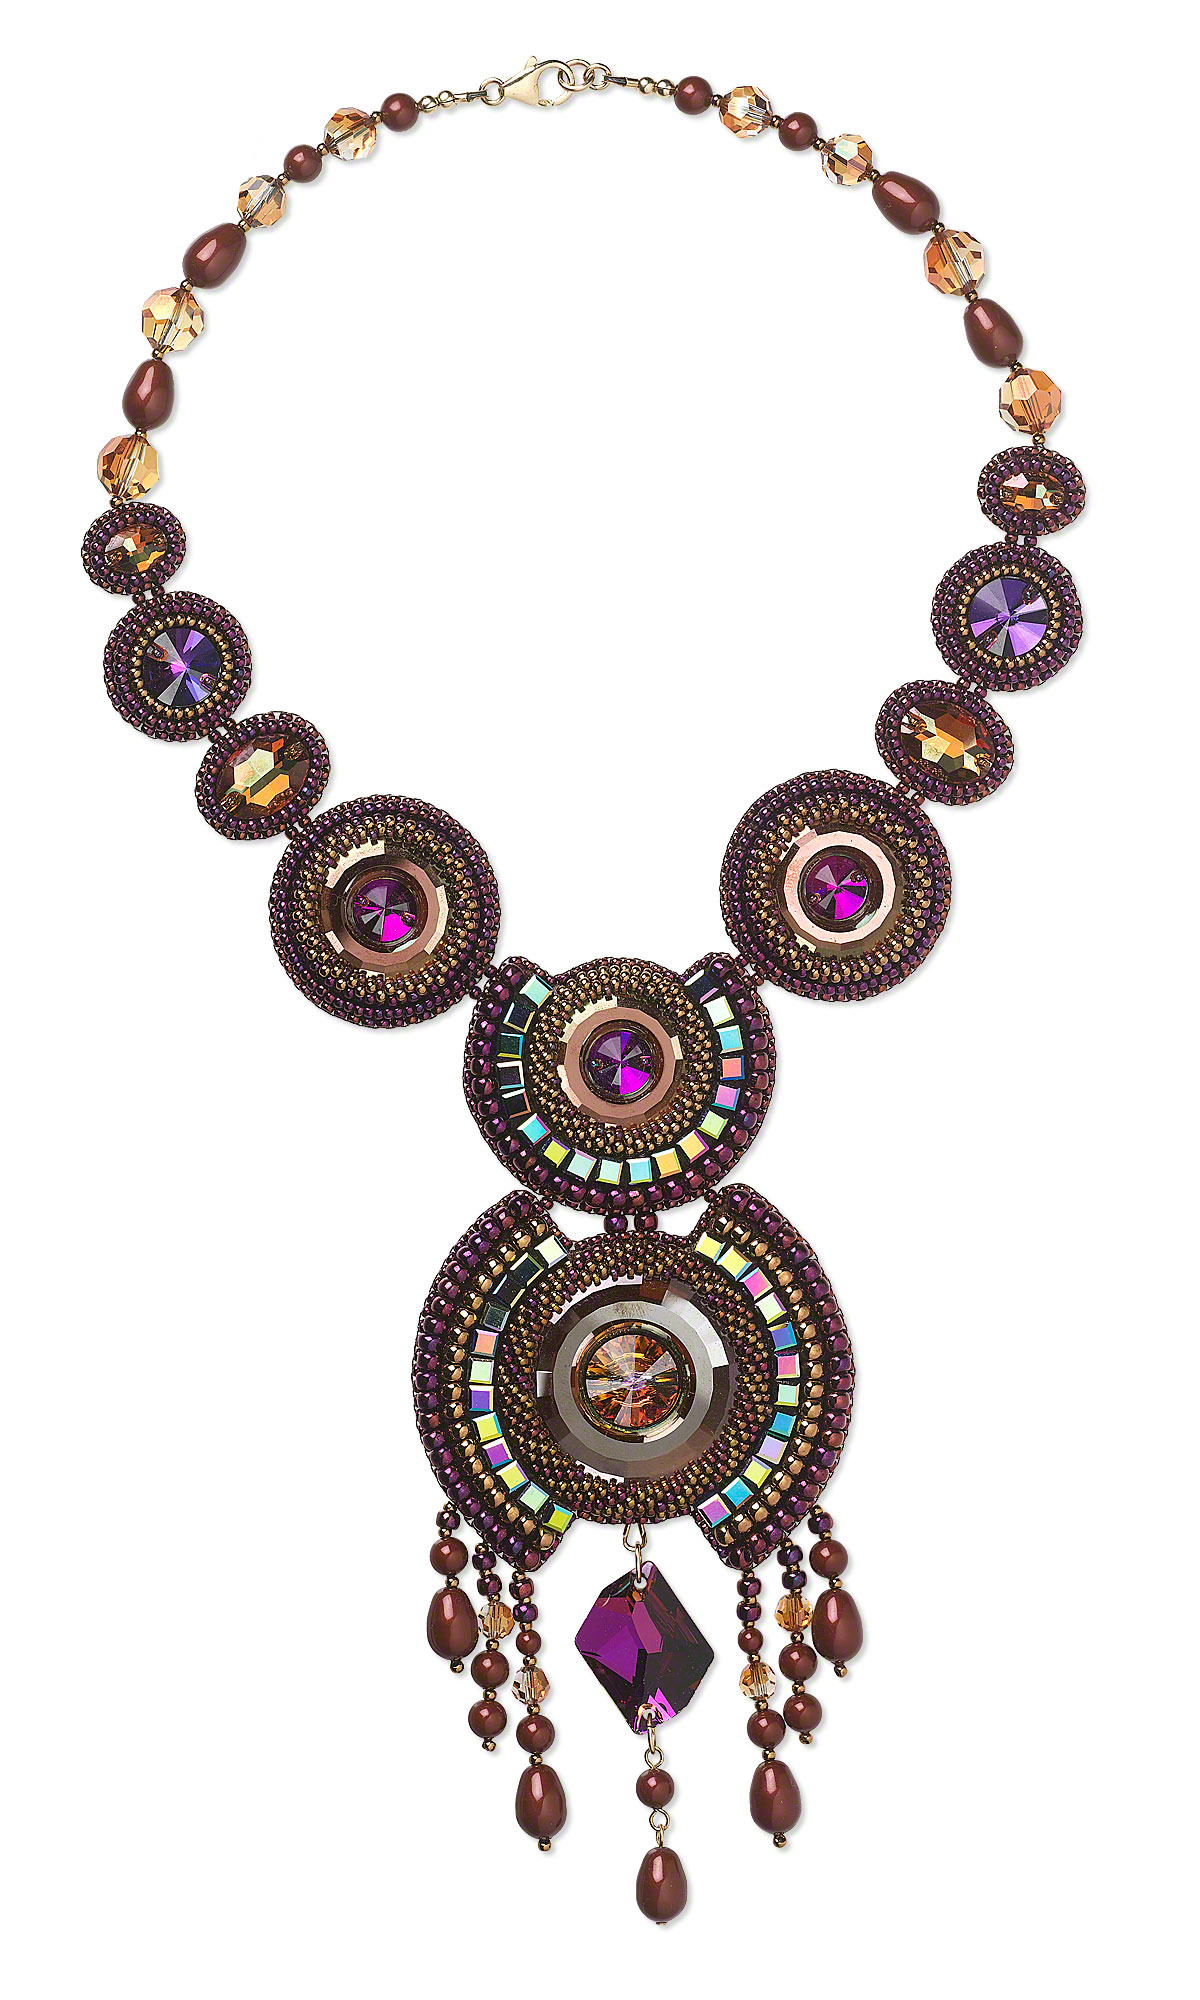 Jewelry design single strand necklace with swarovski